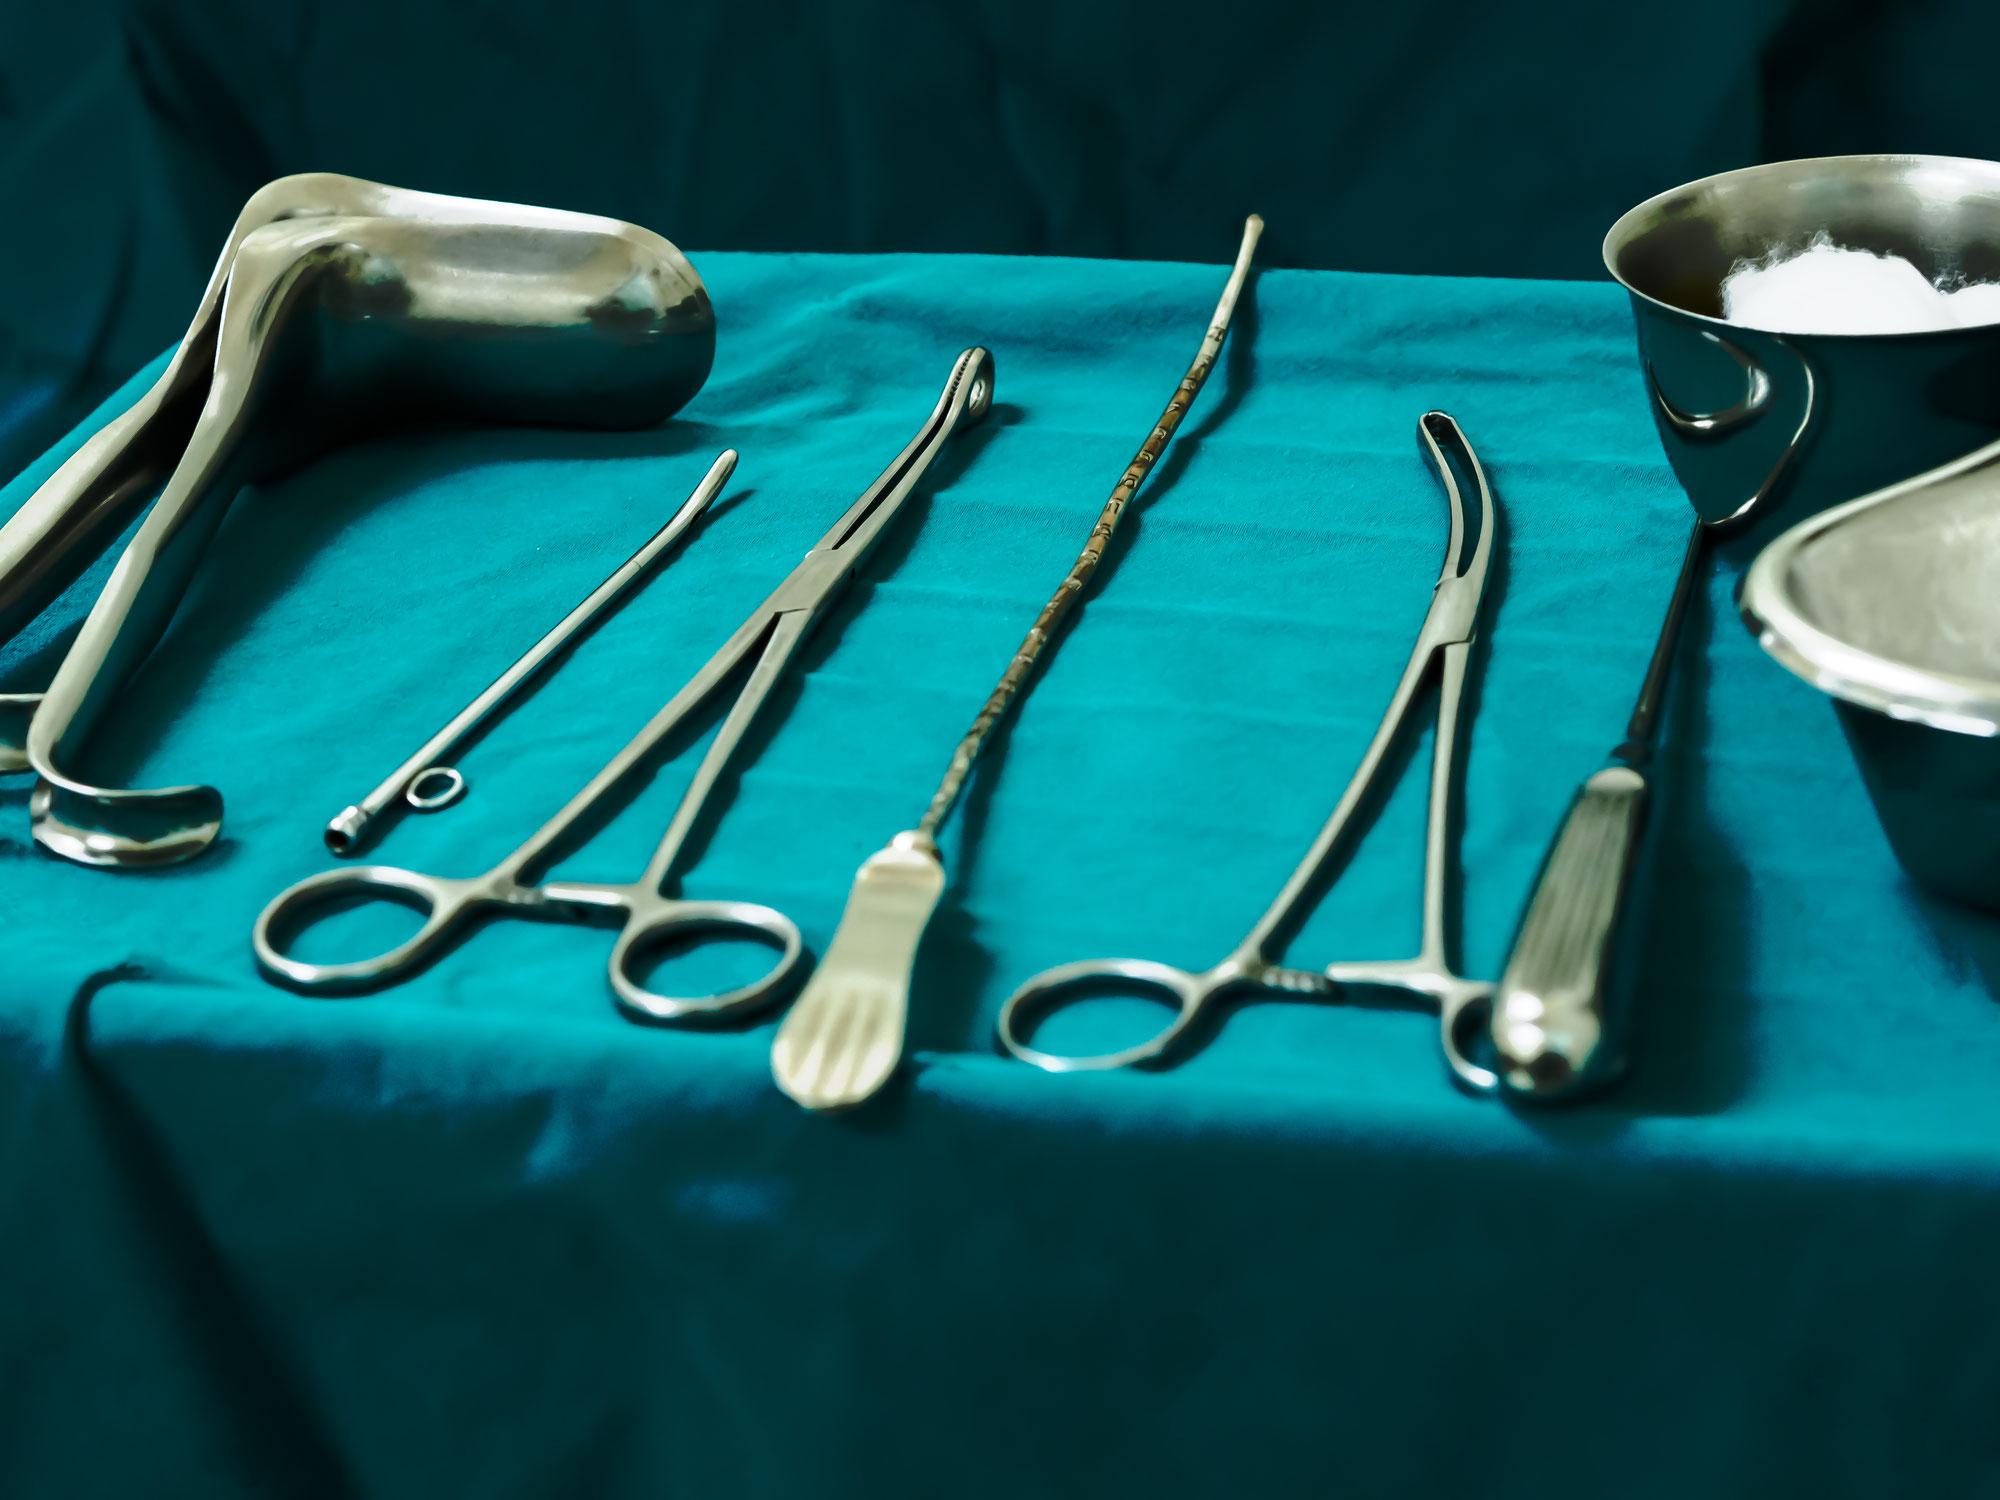 Abtreibung - chirurgische Methode